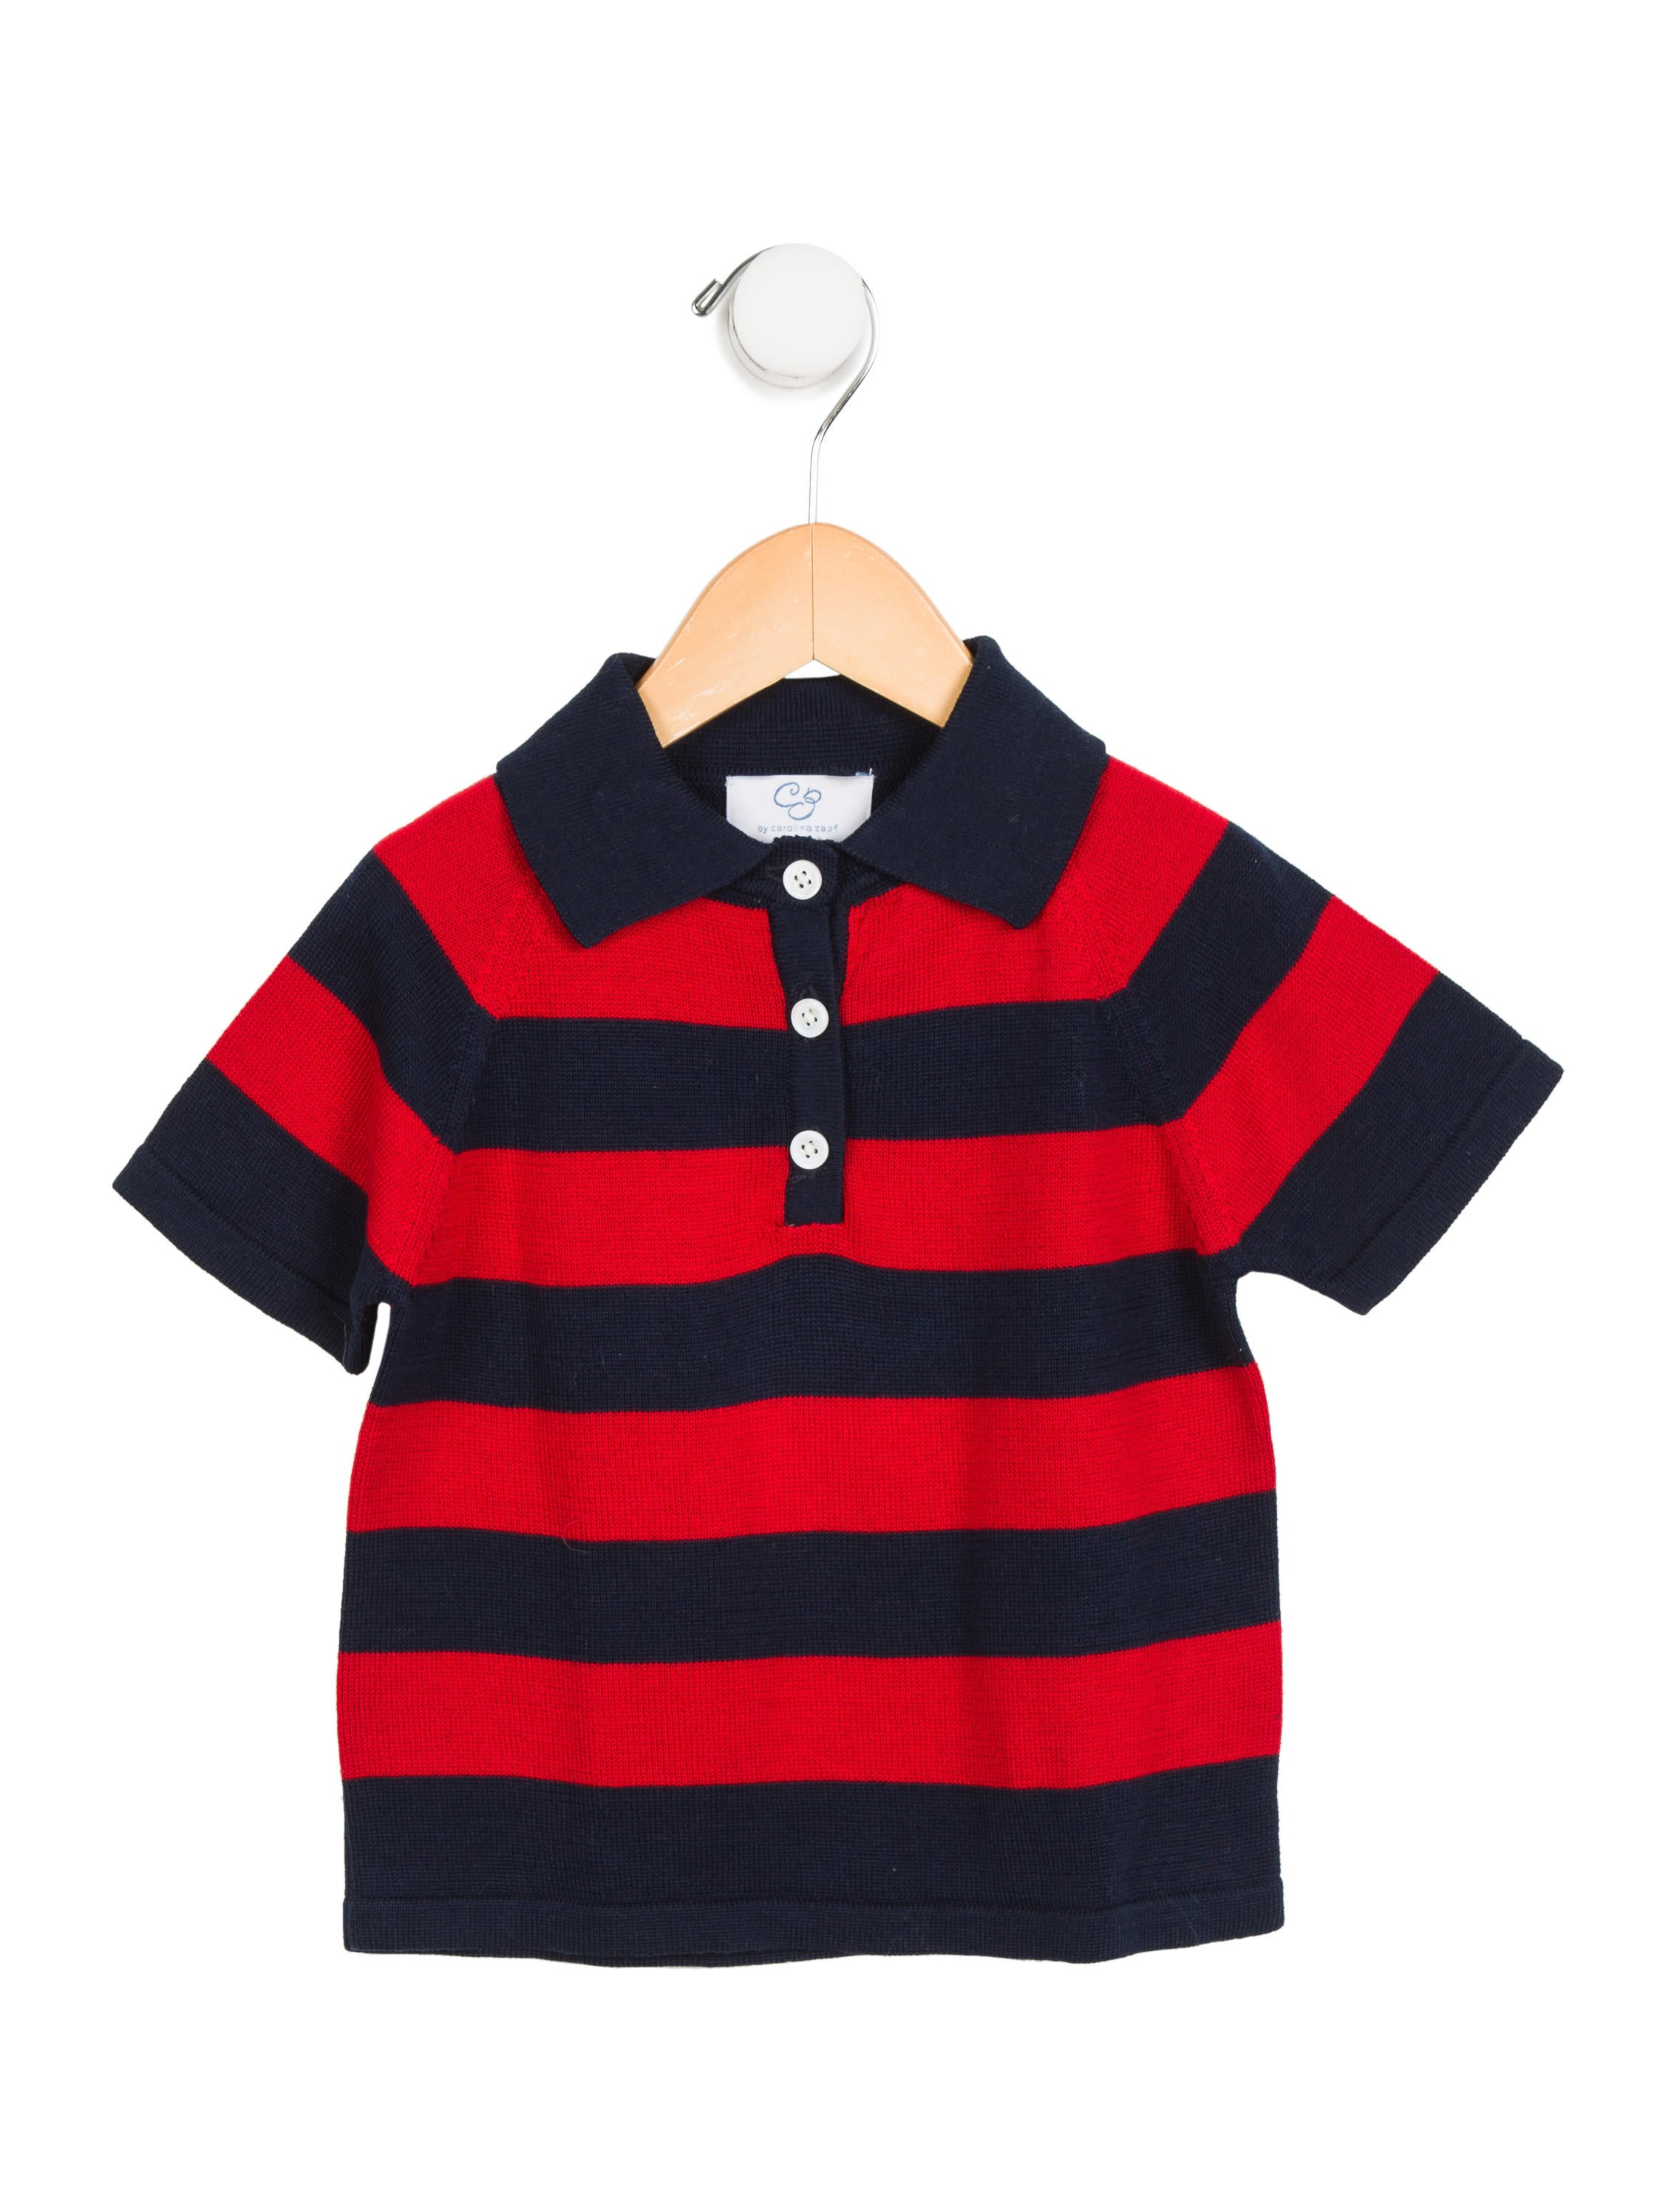 Cz by carolina zapf boys 39 striped polo shirt boys for Boys striped polo shirts